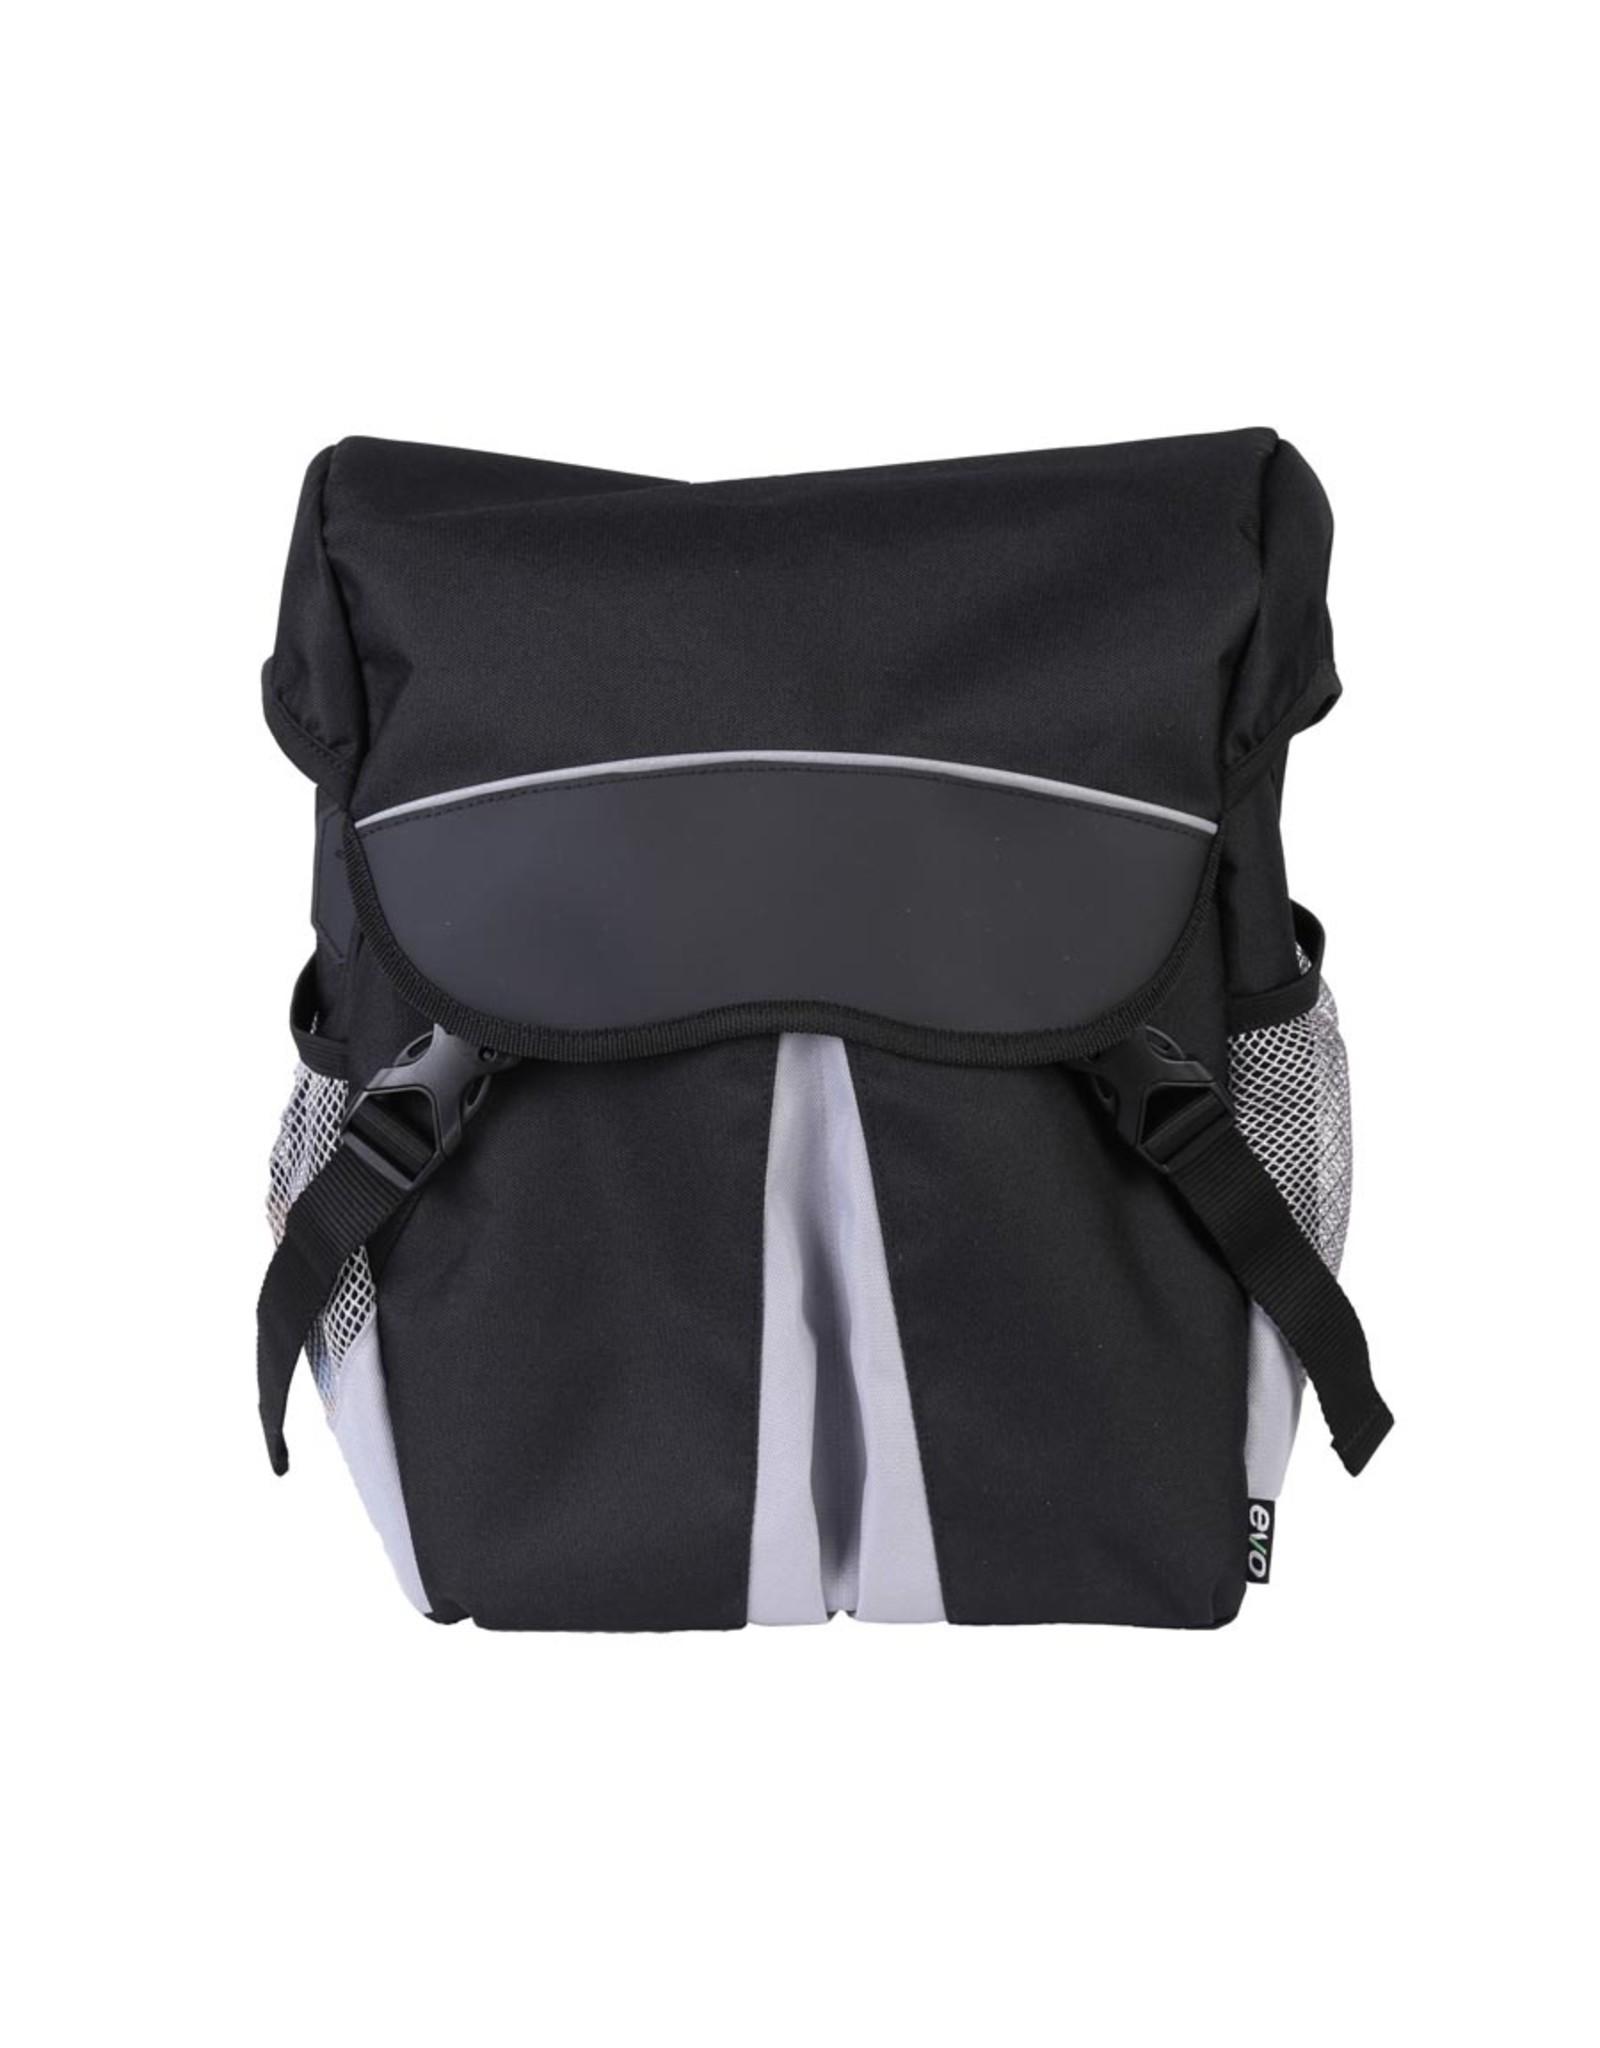 EVO Evo, Clutch, Pannier Bag Set